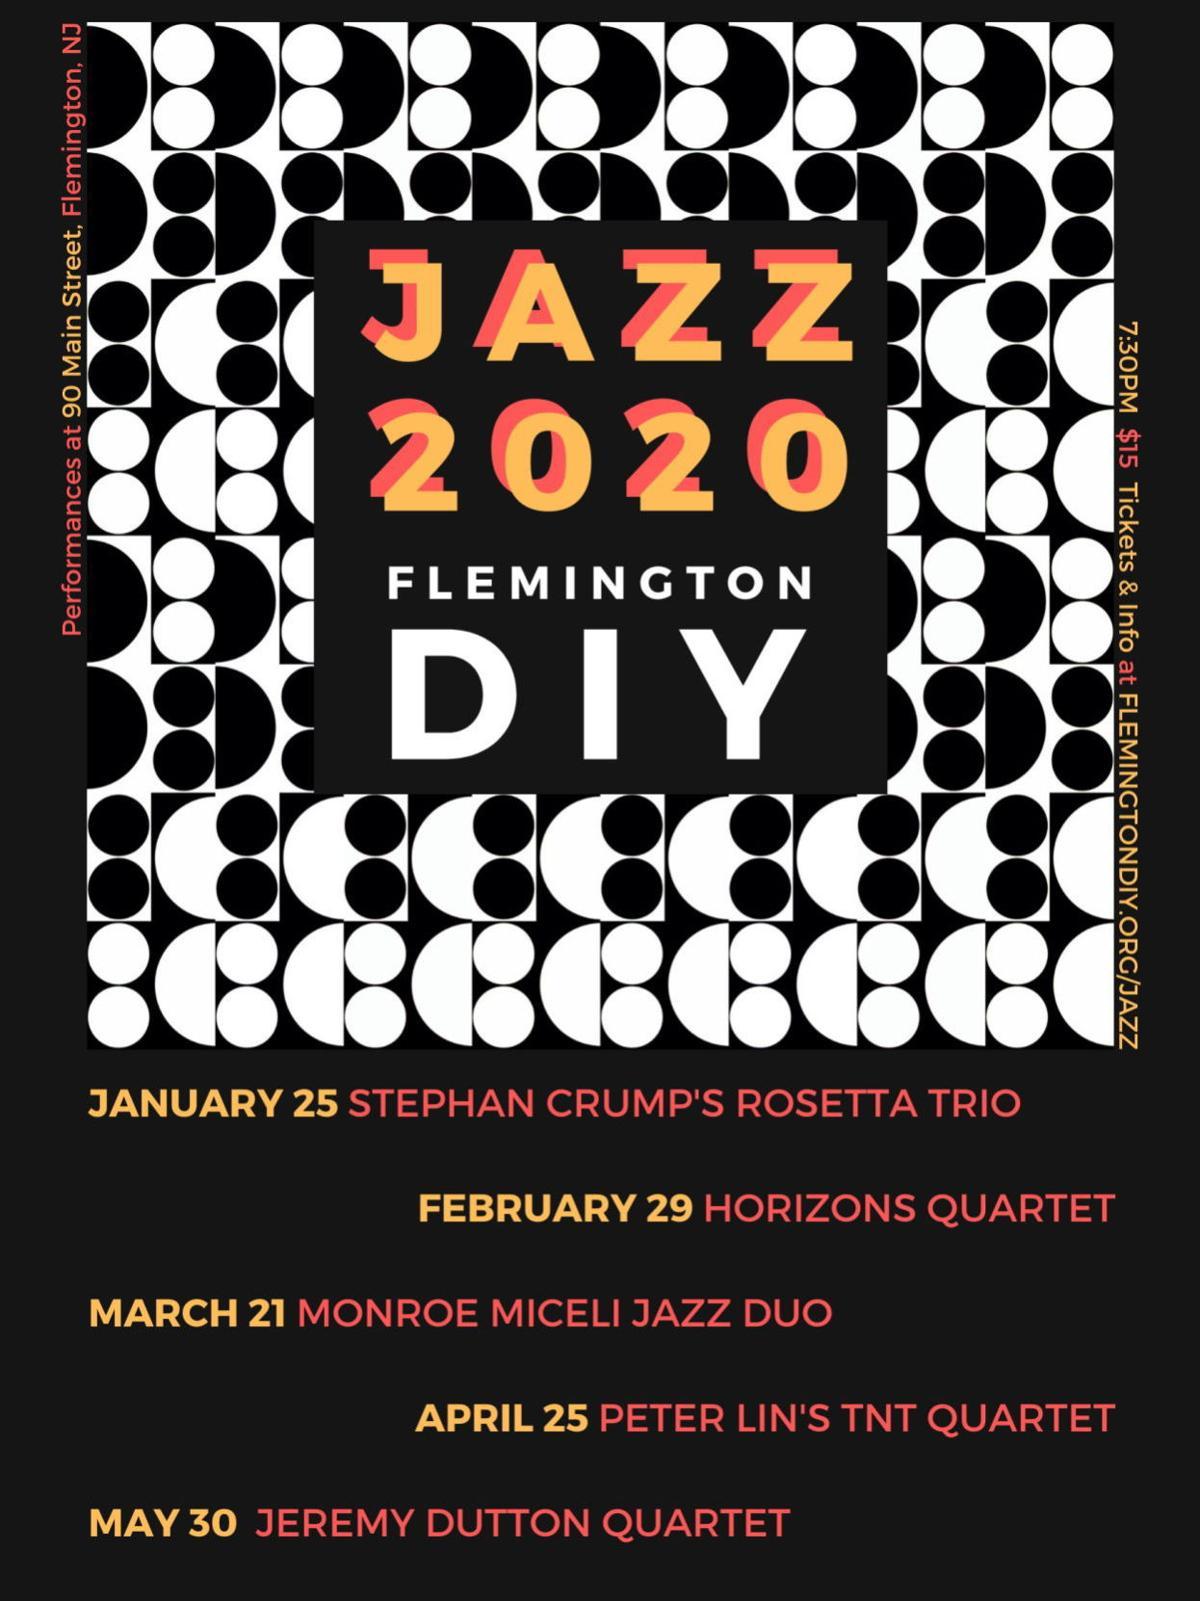 Flemington DIY presents Jazz Series starting Saturday, Jan. 25